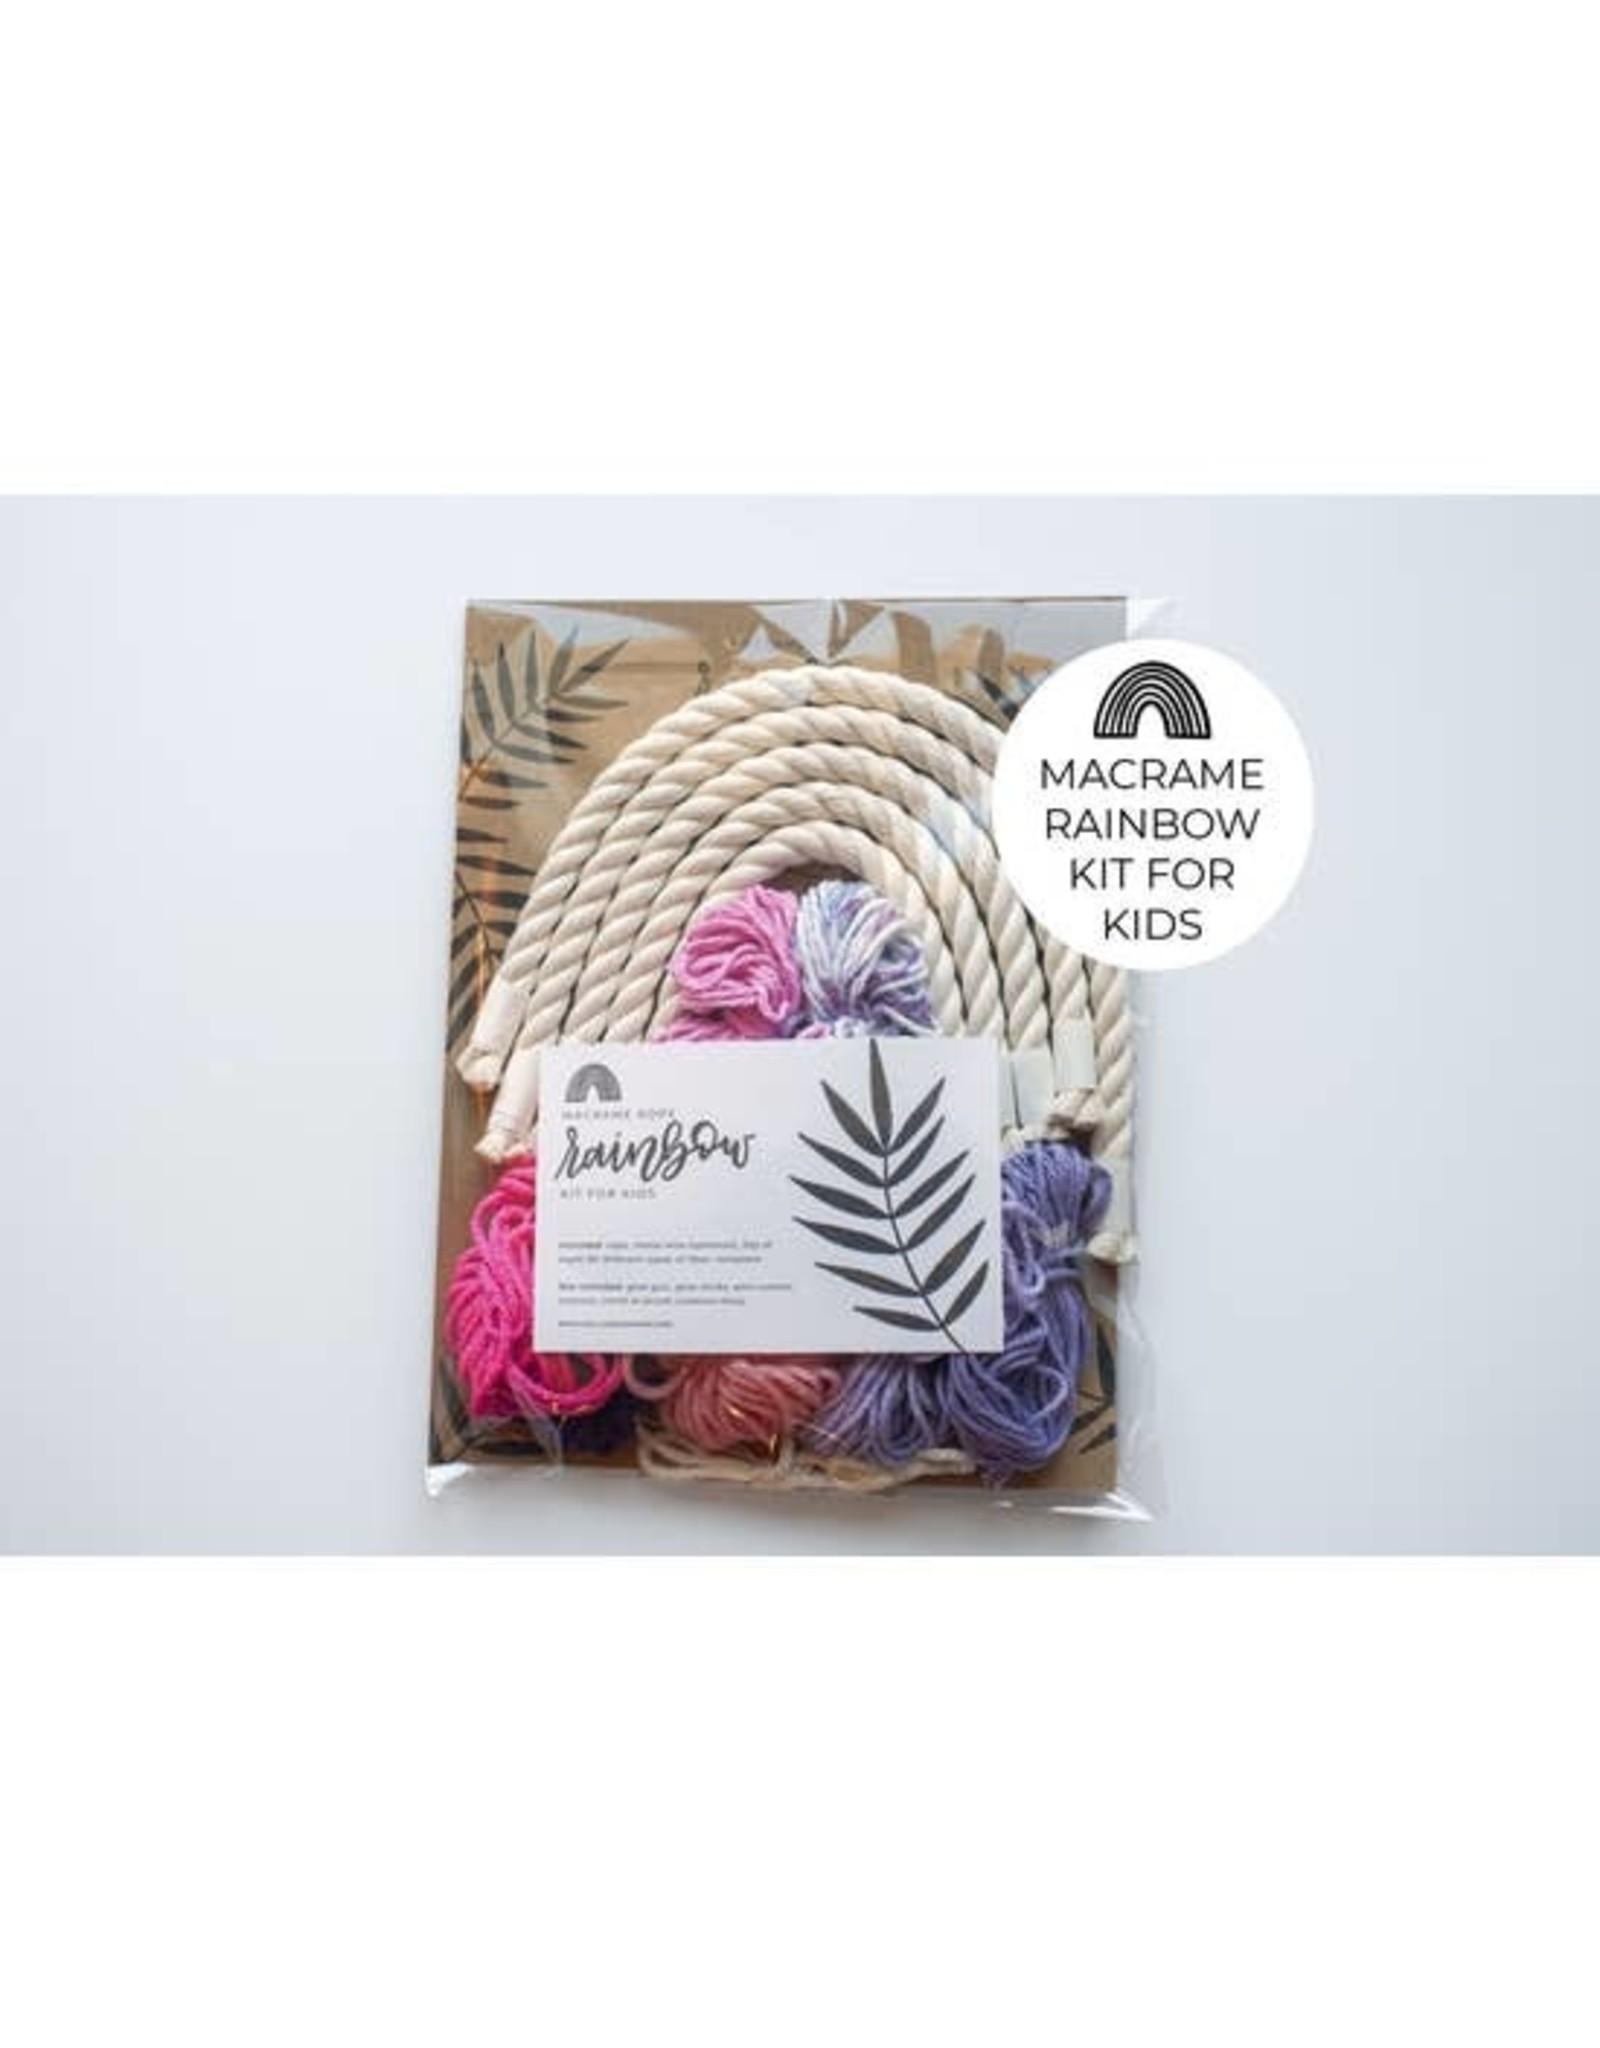 Hello Dear Heart Macrame Rainbow Kits for Kids: Pink & Purple